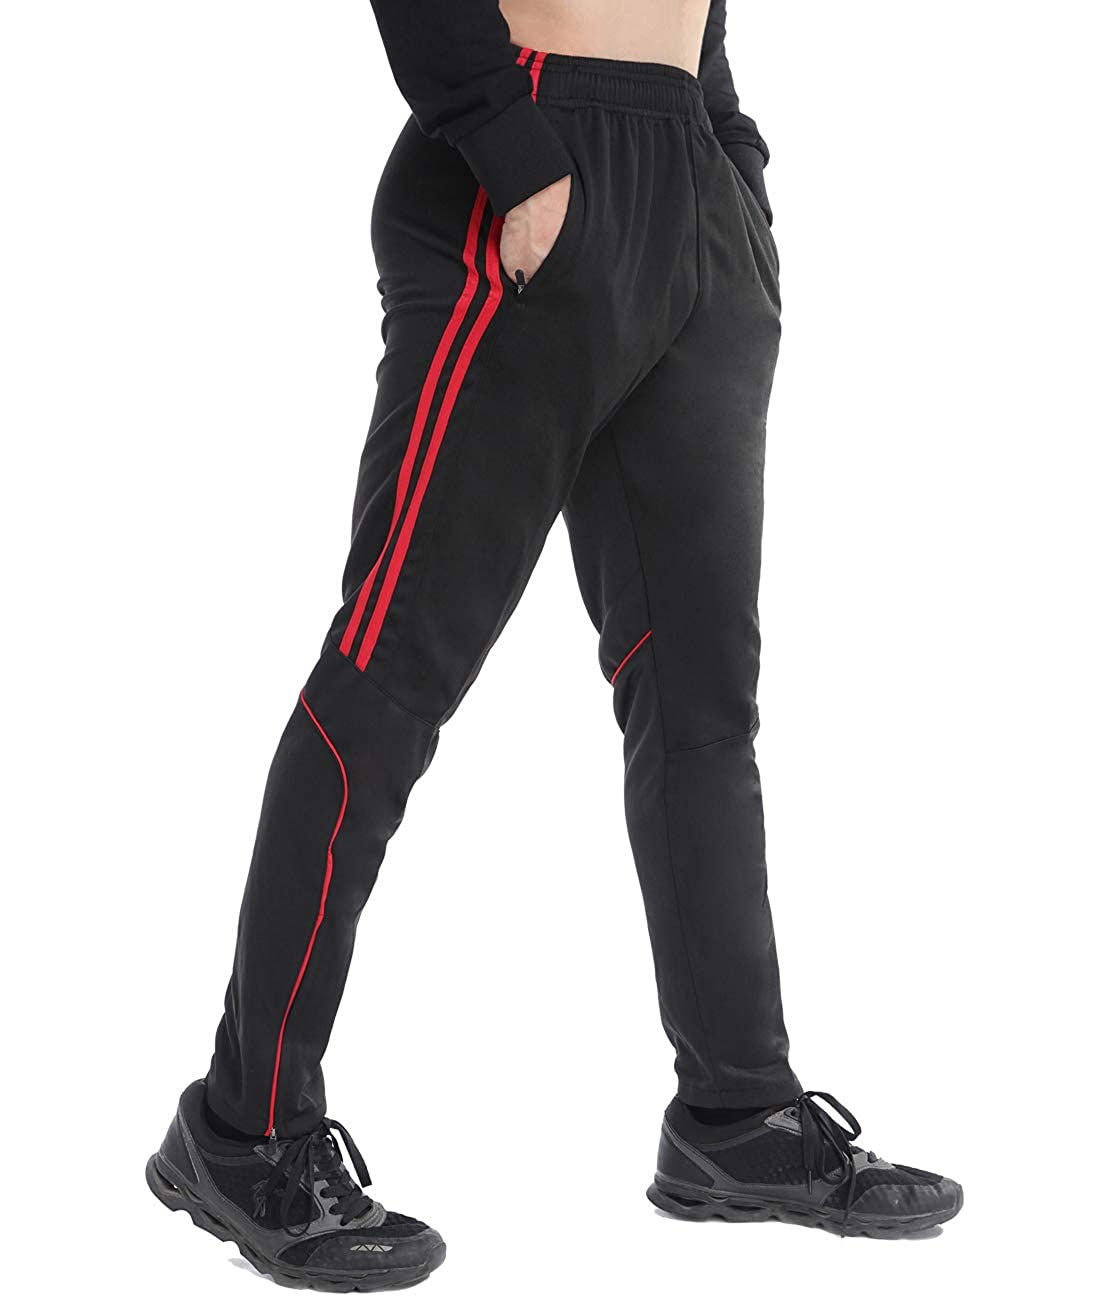 Men's Plus Size Sweatpants Drawstring Gym Apparel Zip Pockets Casual Pants Sports Trousers Workout, Gym, Jogging, Running, Training